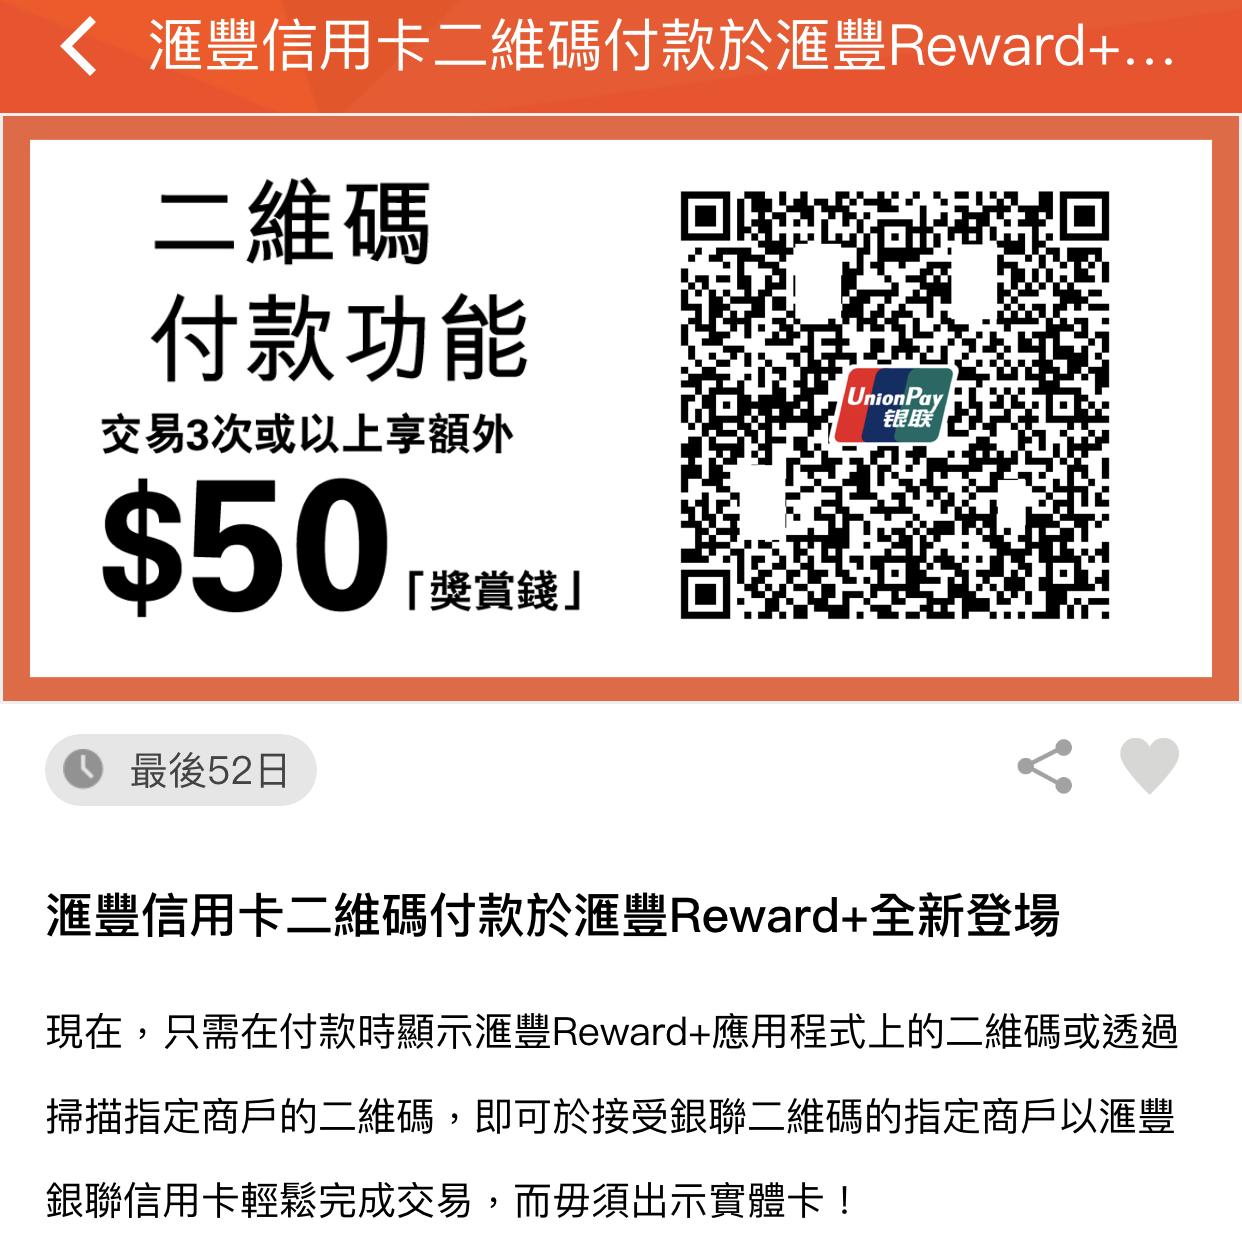 HSBC Reward+新增銀行銀聯二維碼付款功能!交易3次或以上享額外$50「獎賞錢」